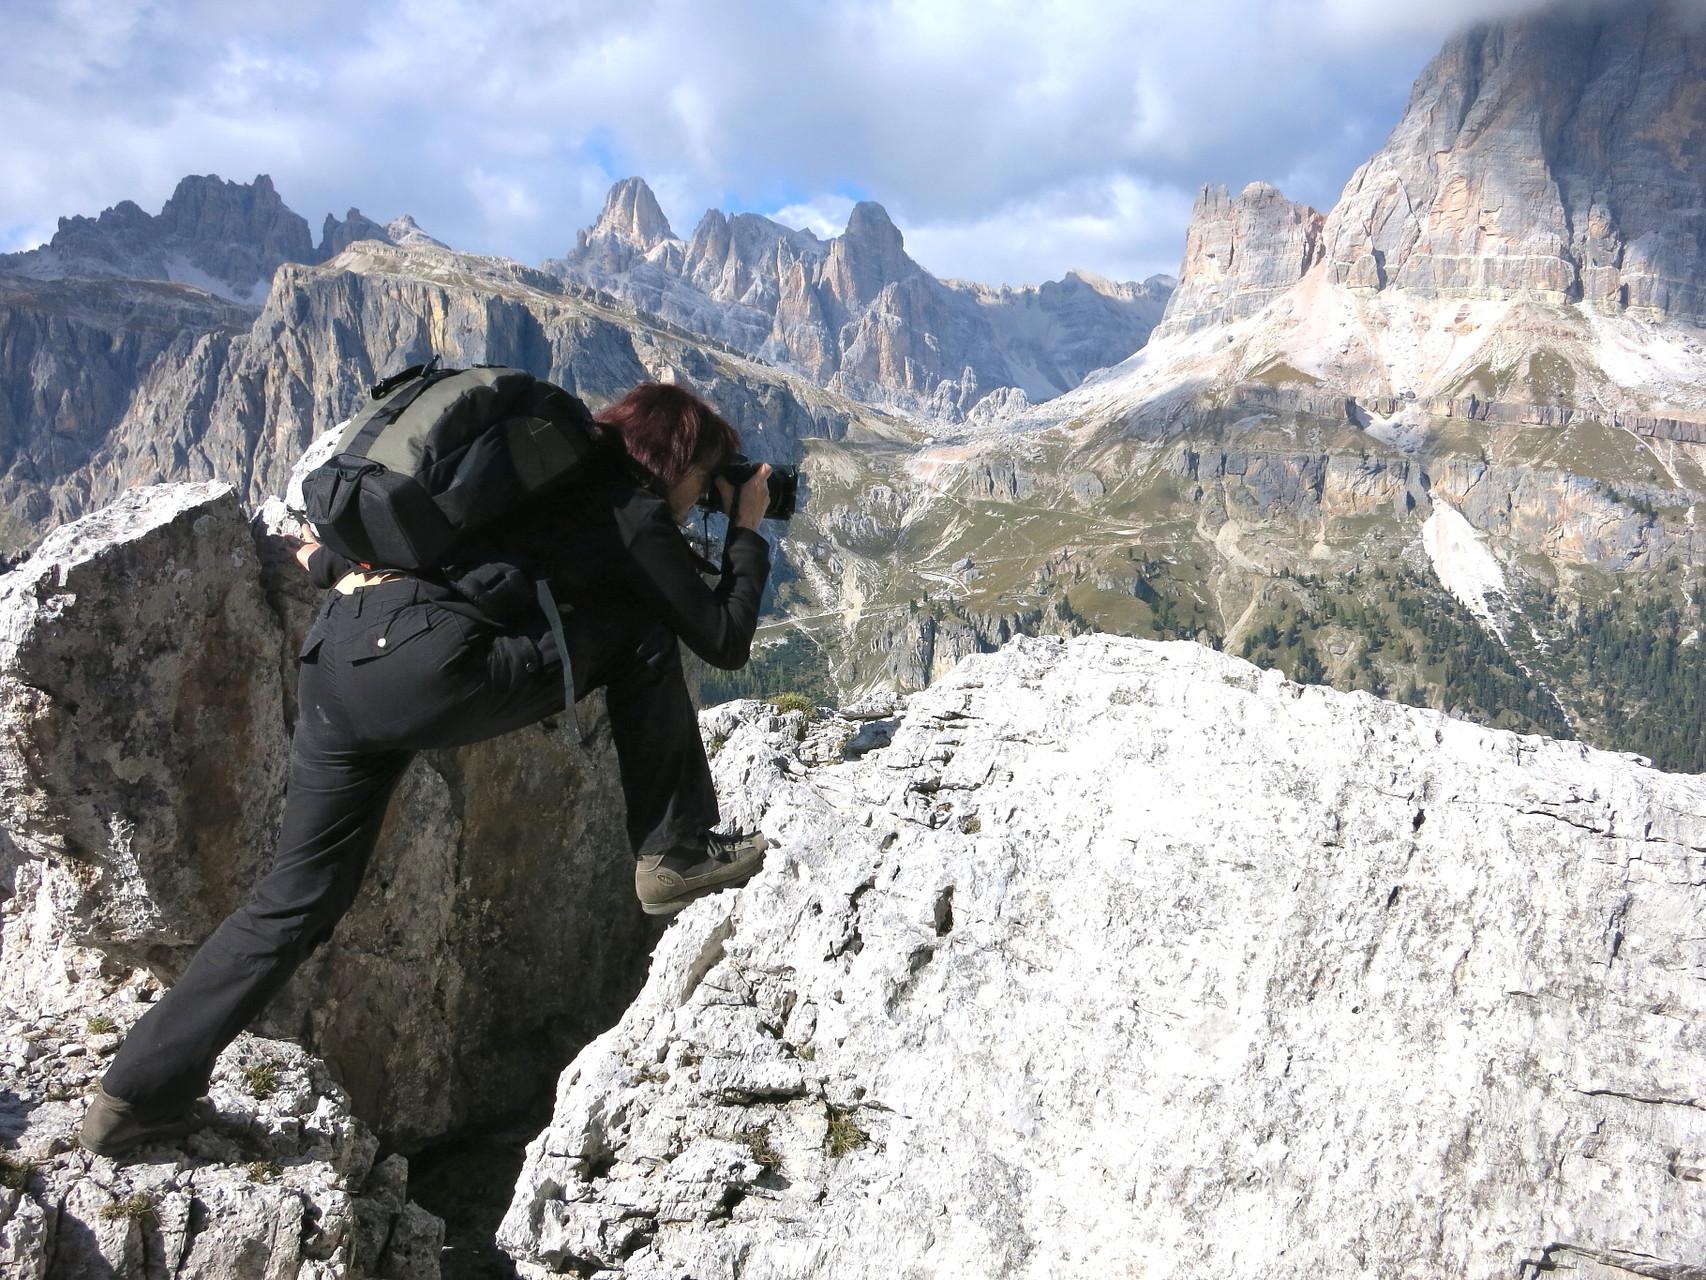 Italien; Dolomitenpanorama im Fokus (Foto: Werner Hack)